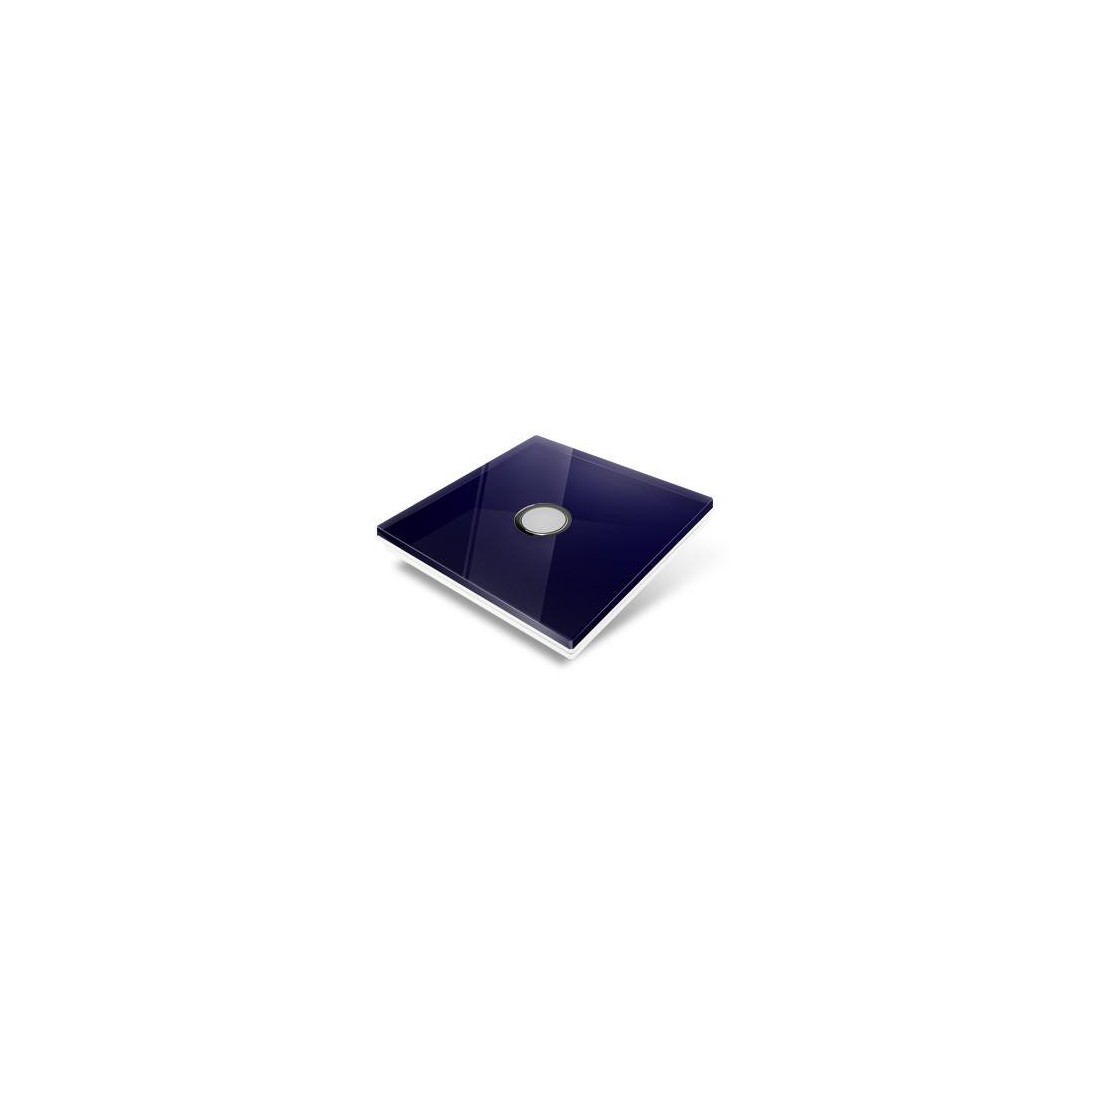 Cubierta para interruptor Edisio - crystal azul noche